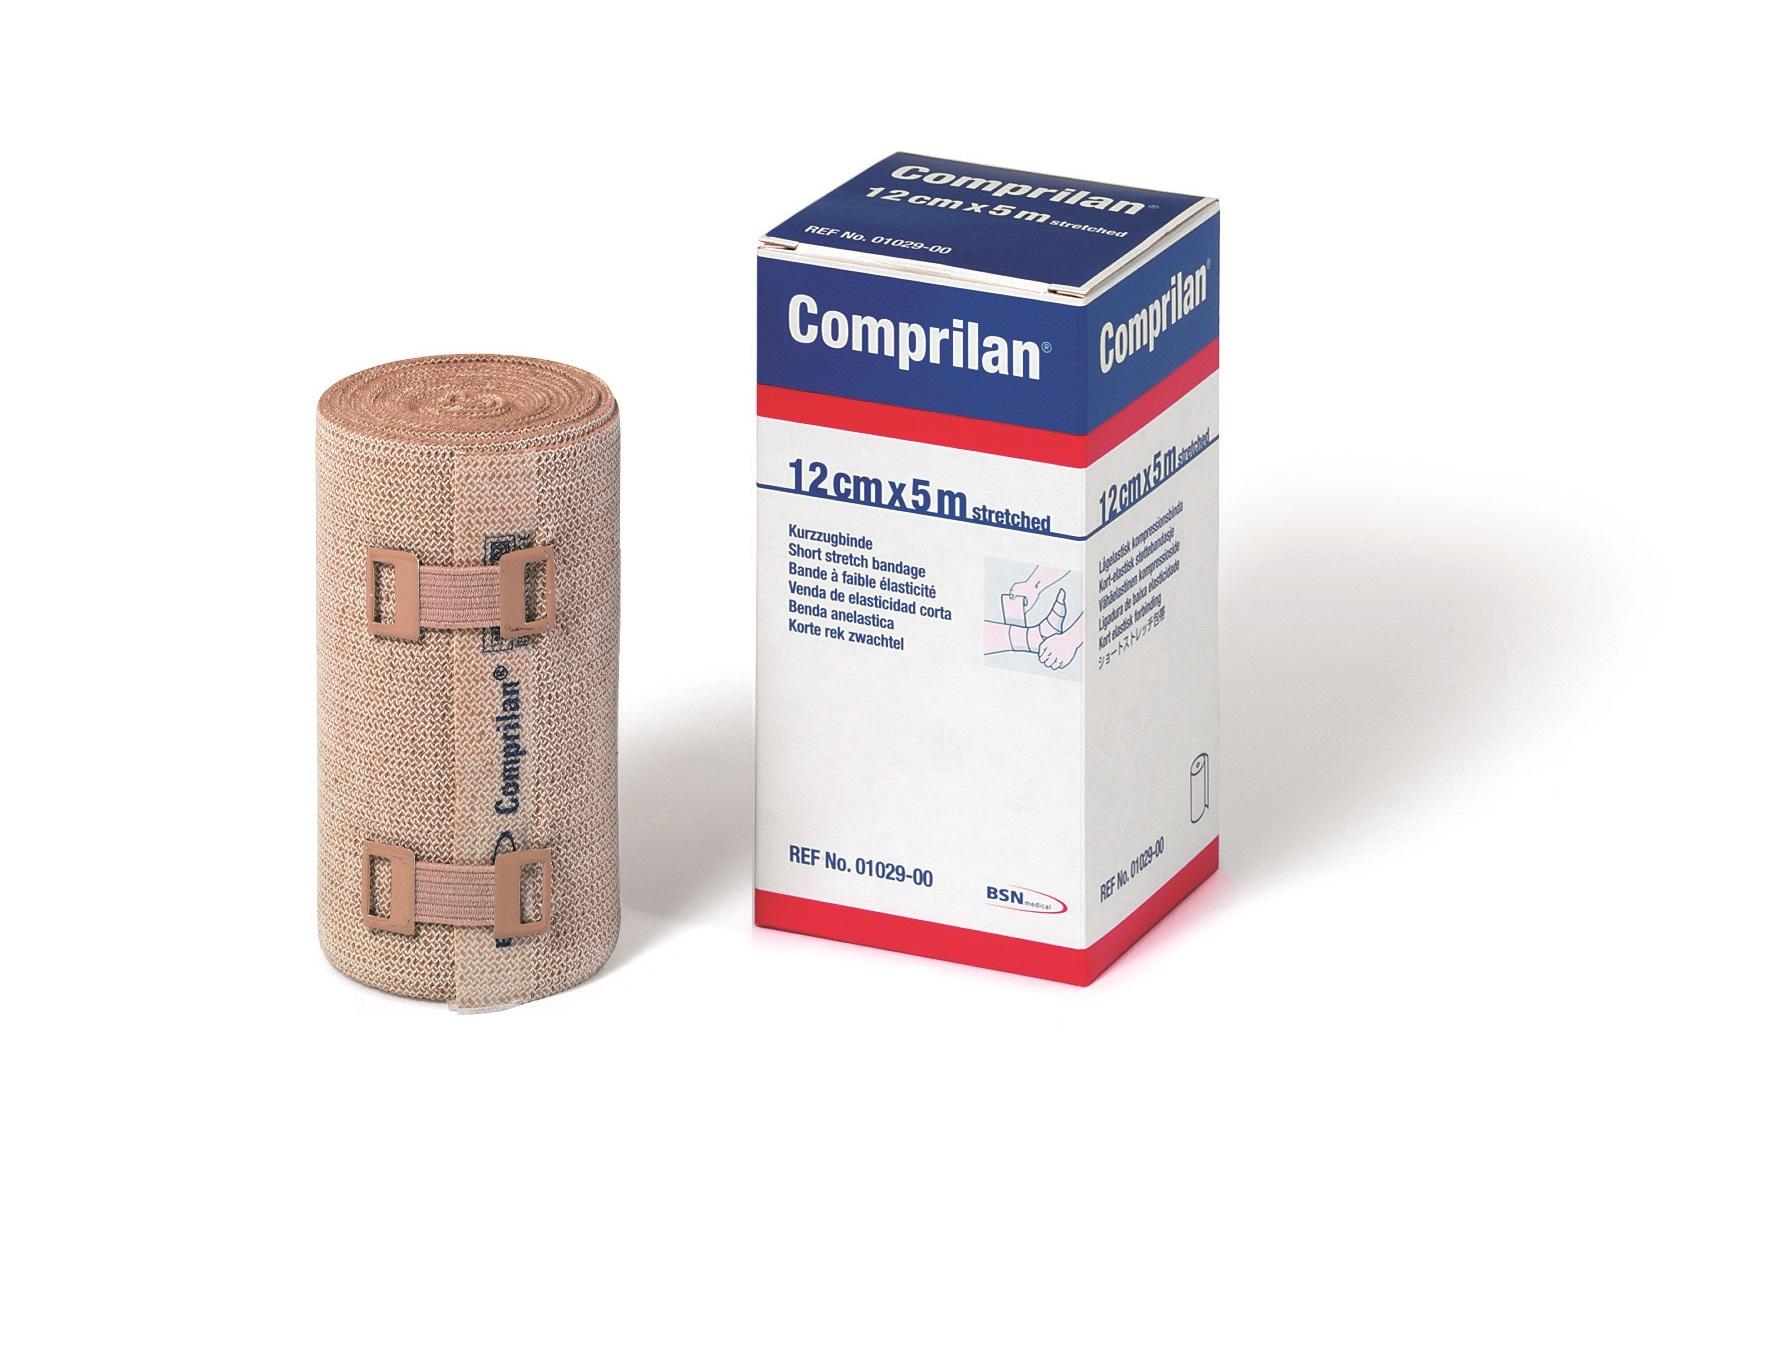 "JOBST® Comprilan® Short Stretch Bandage 4.5""x5Yd/12Cm X 5M"